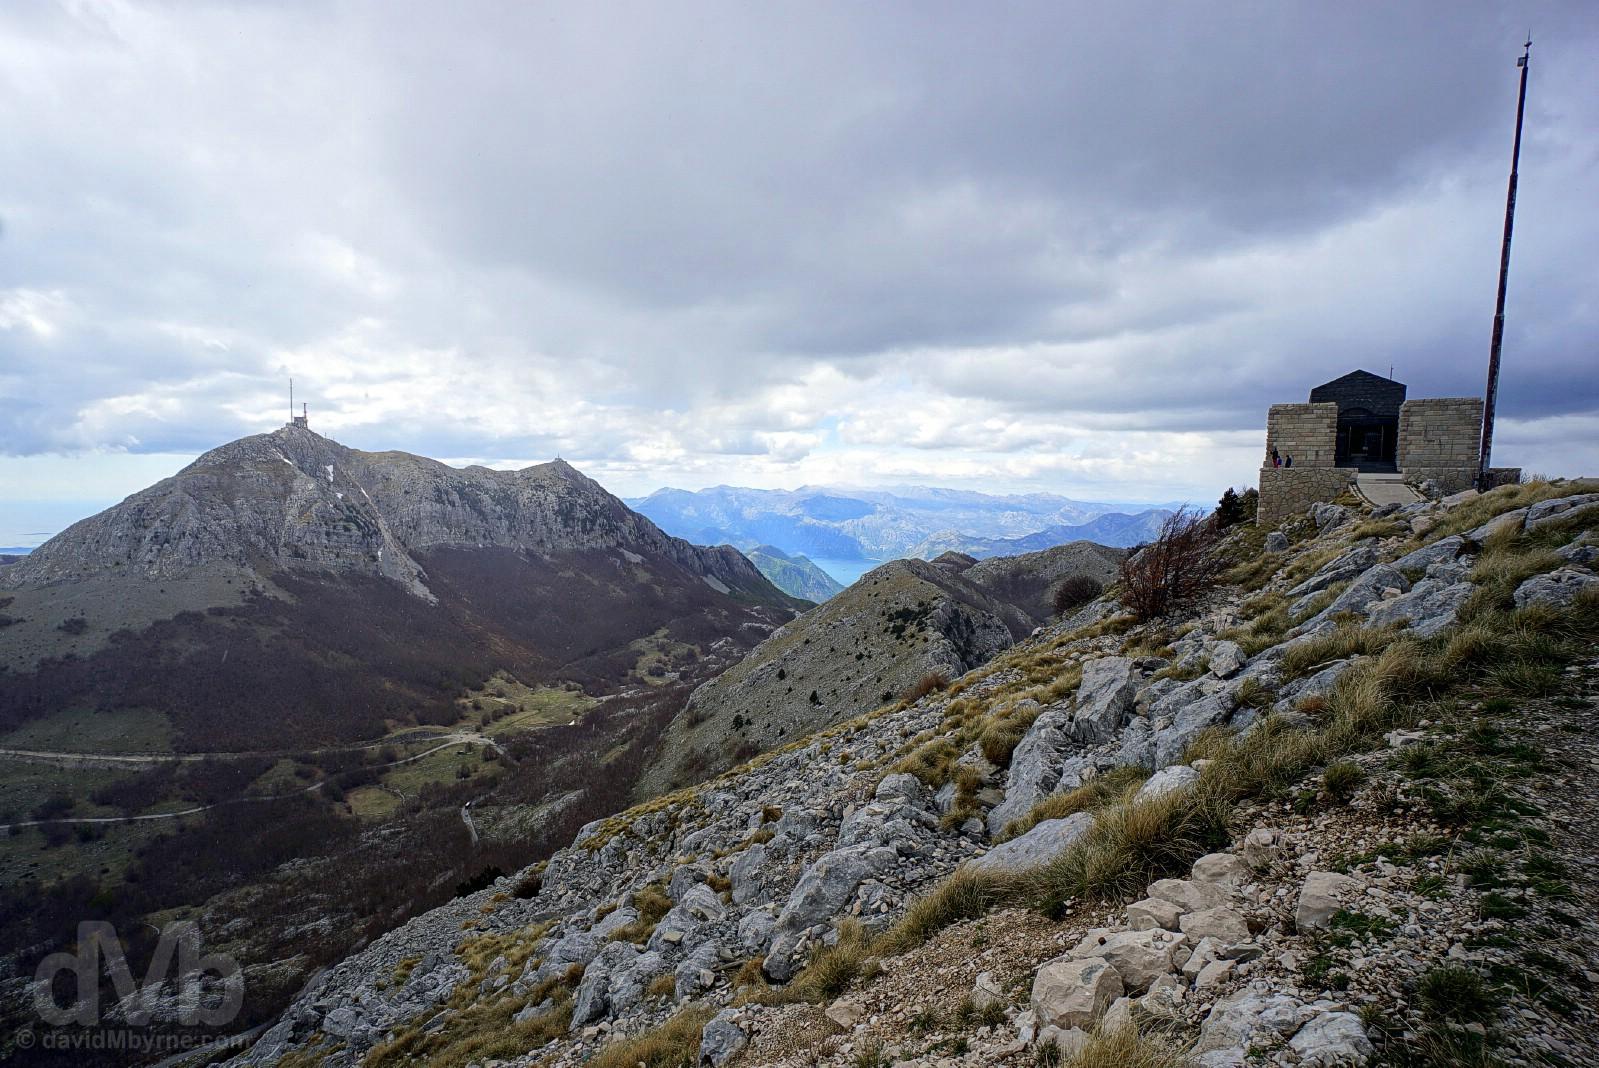 Njegos Mausoleum, the world's highest, in Lovcen National Park, Montenegro. April 20, 2017.